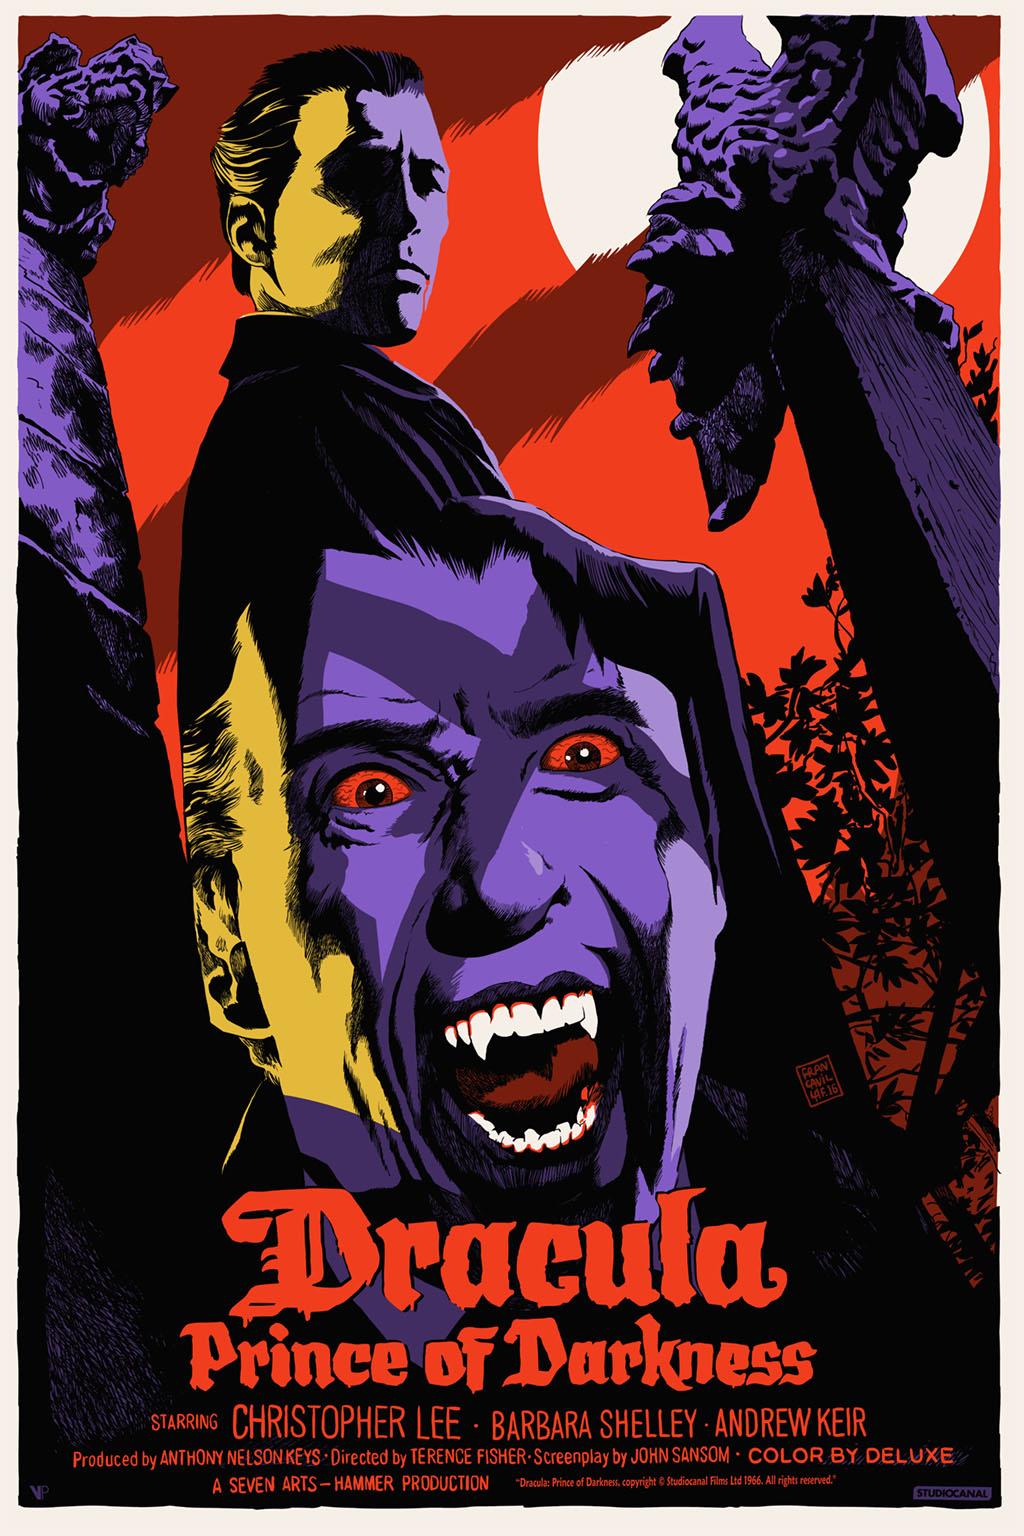 Dracula: Prince of Darkness Print by Francesco Francavilla Revealed by Vice Press